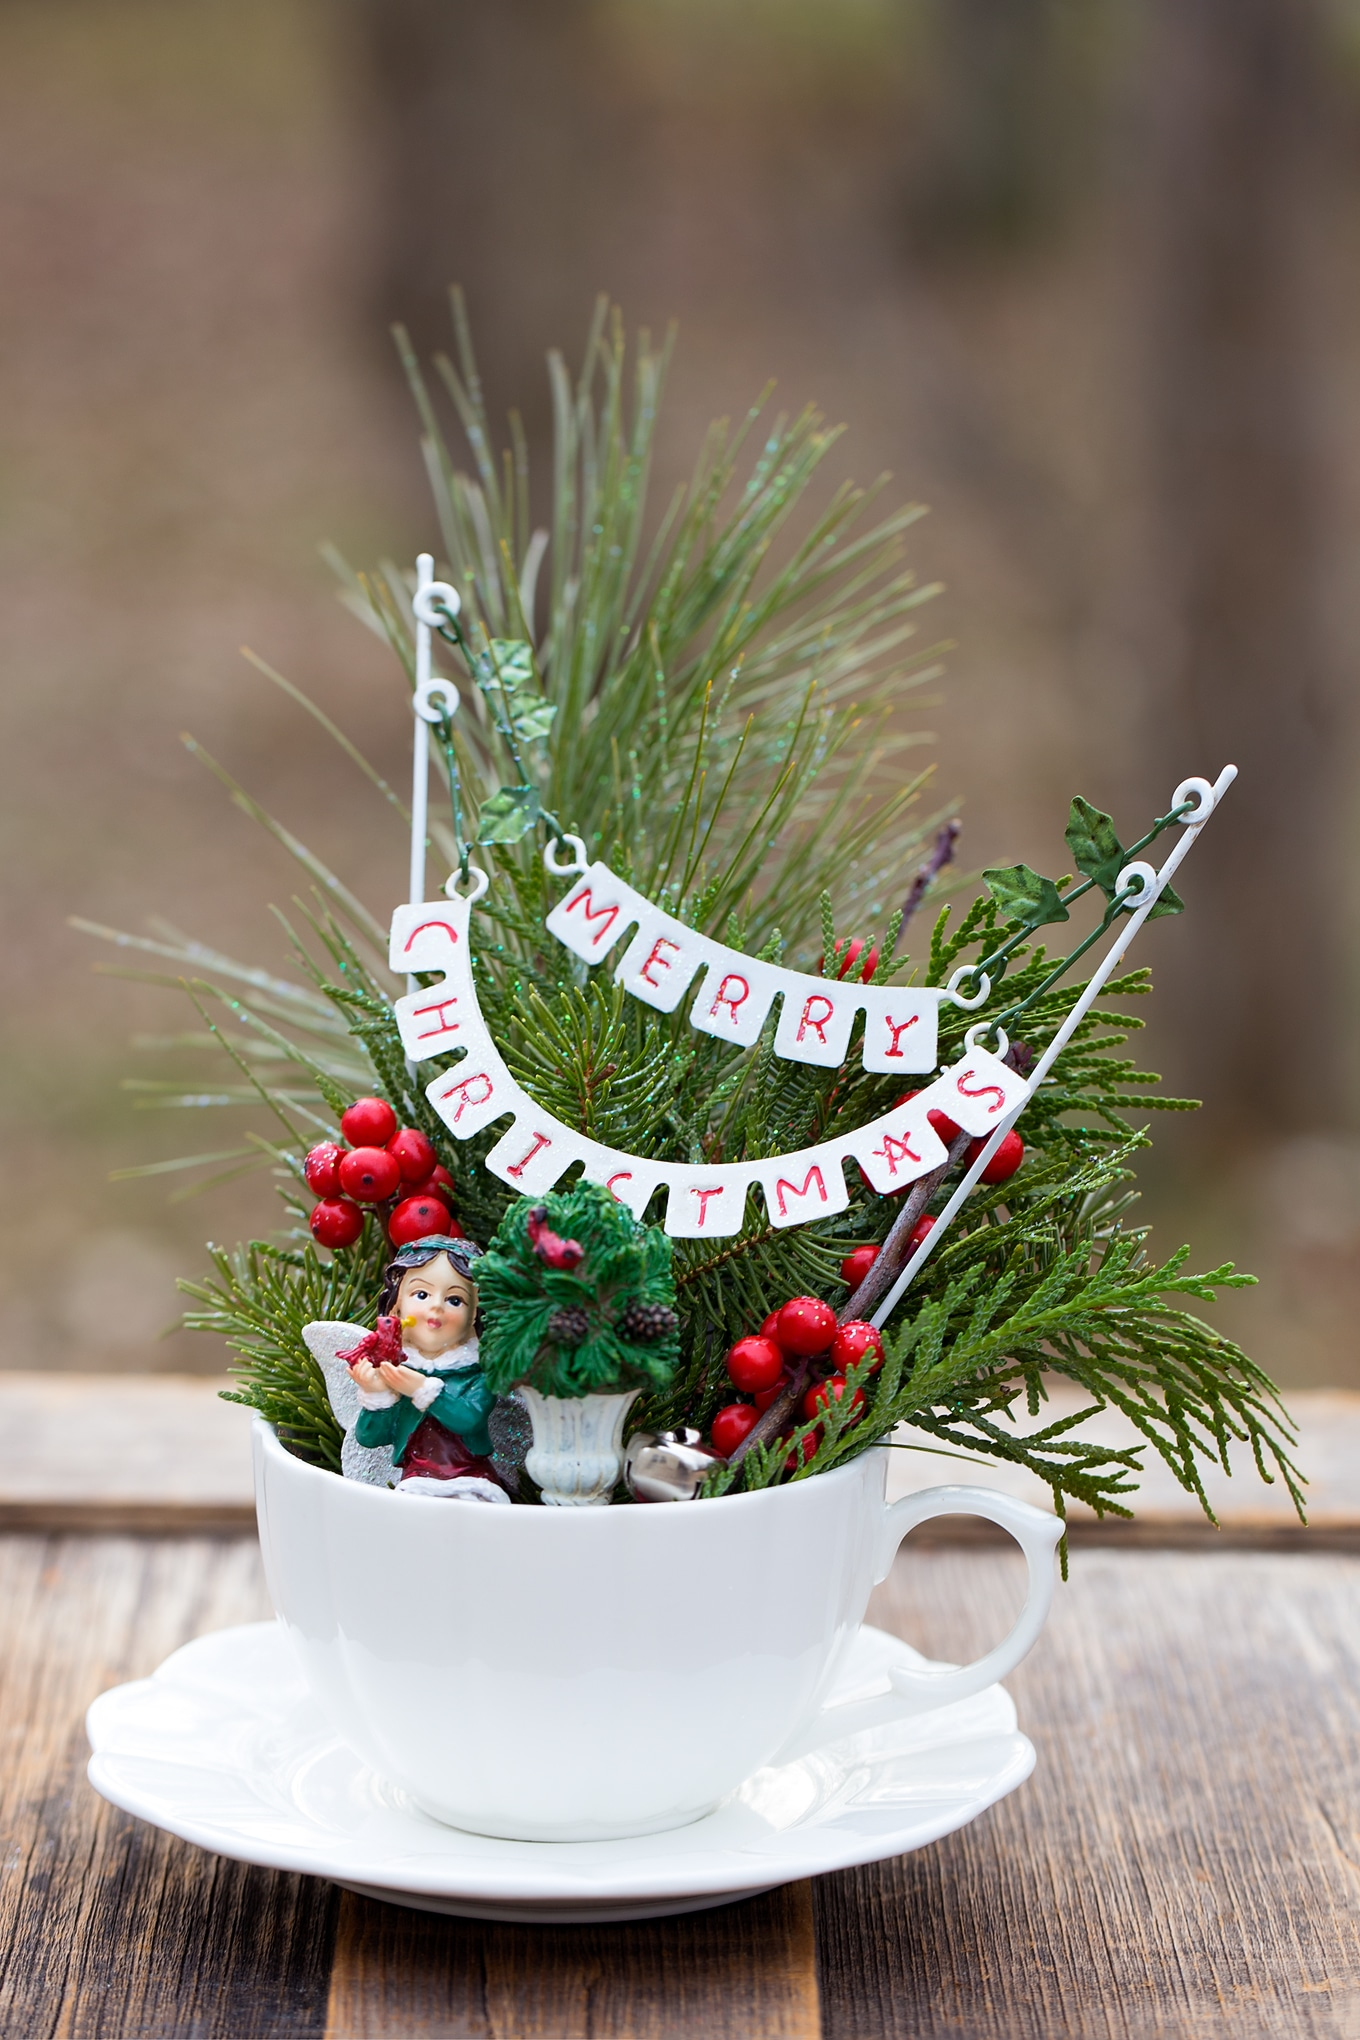 How to Make a Festive Christmas Teacup Garden